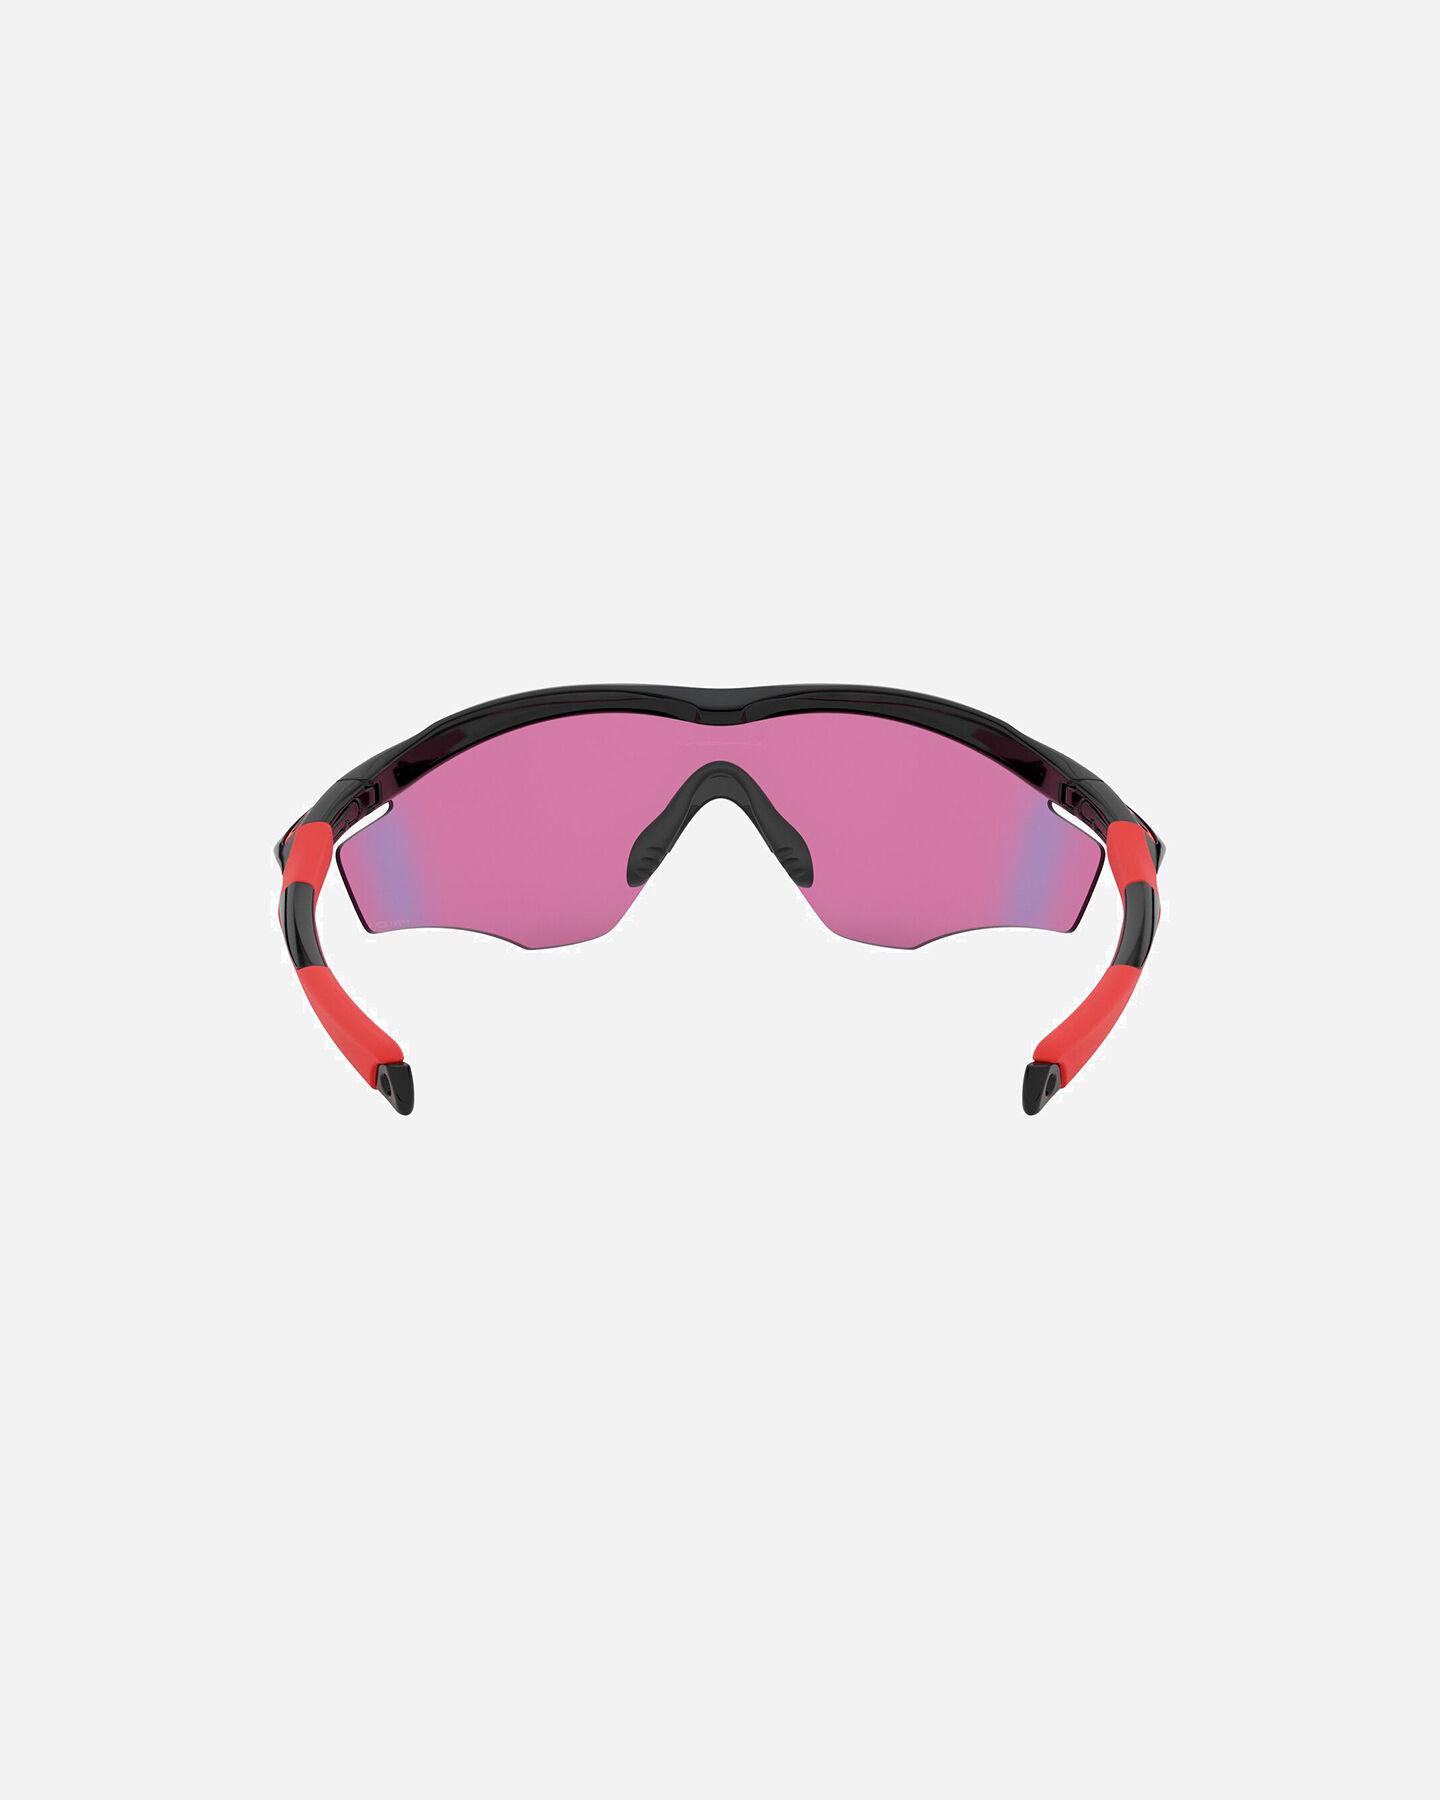 Occhiali OAKLEY M2 FRAME XL PRIZM S1313254|9999|UNI scatto 3